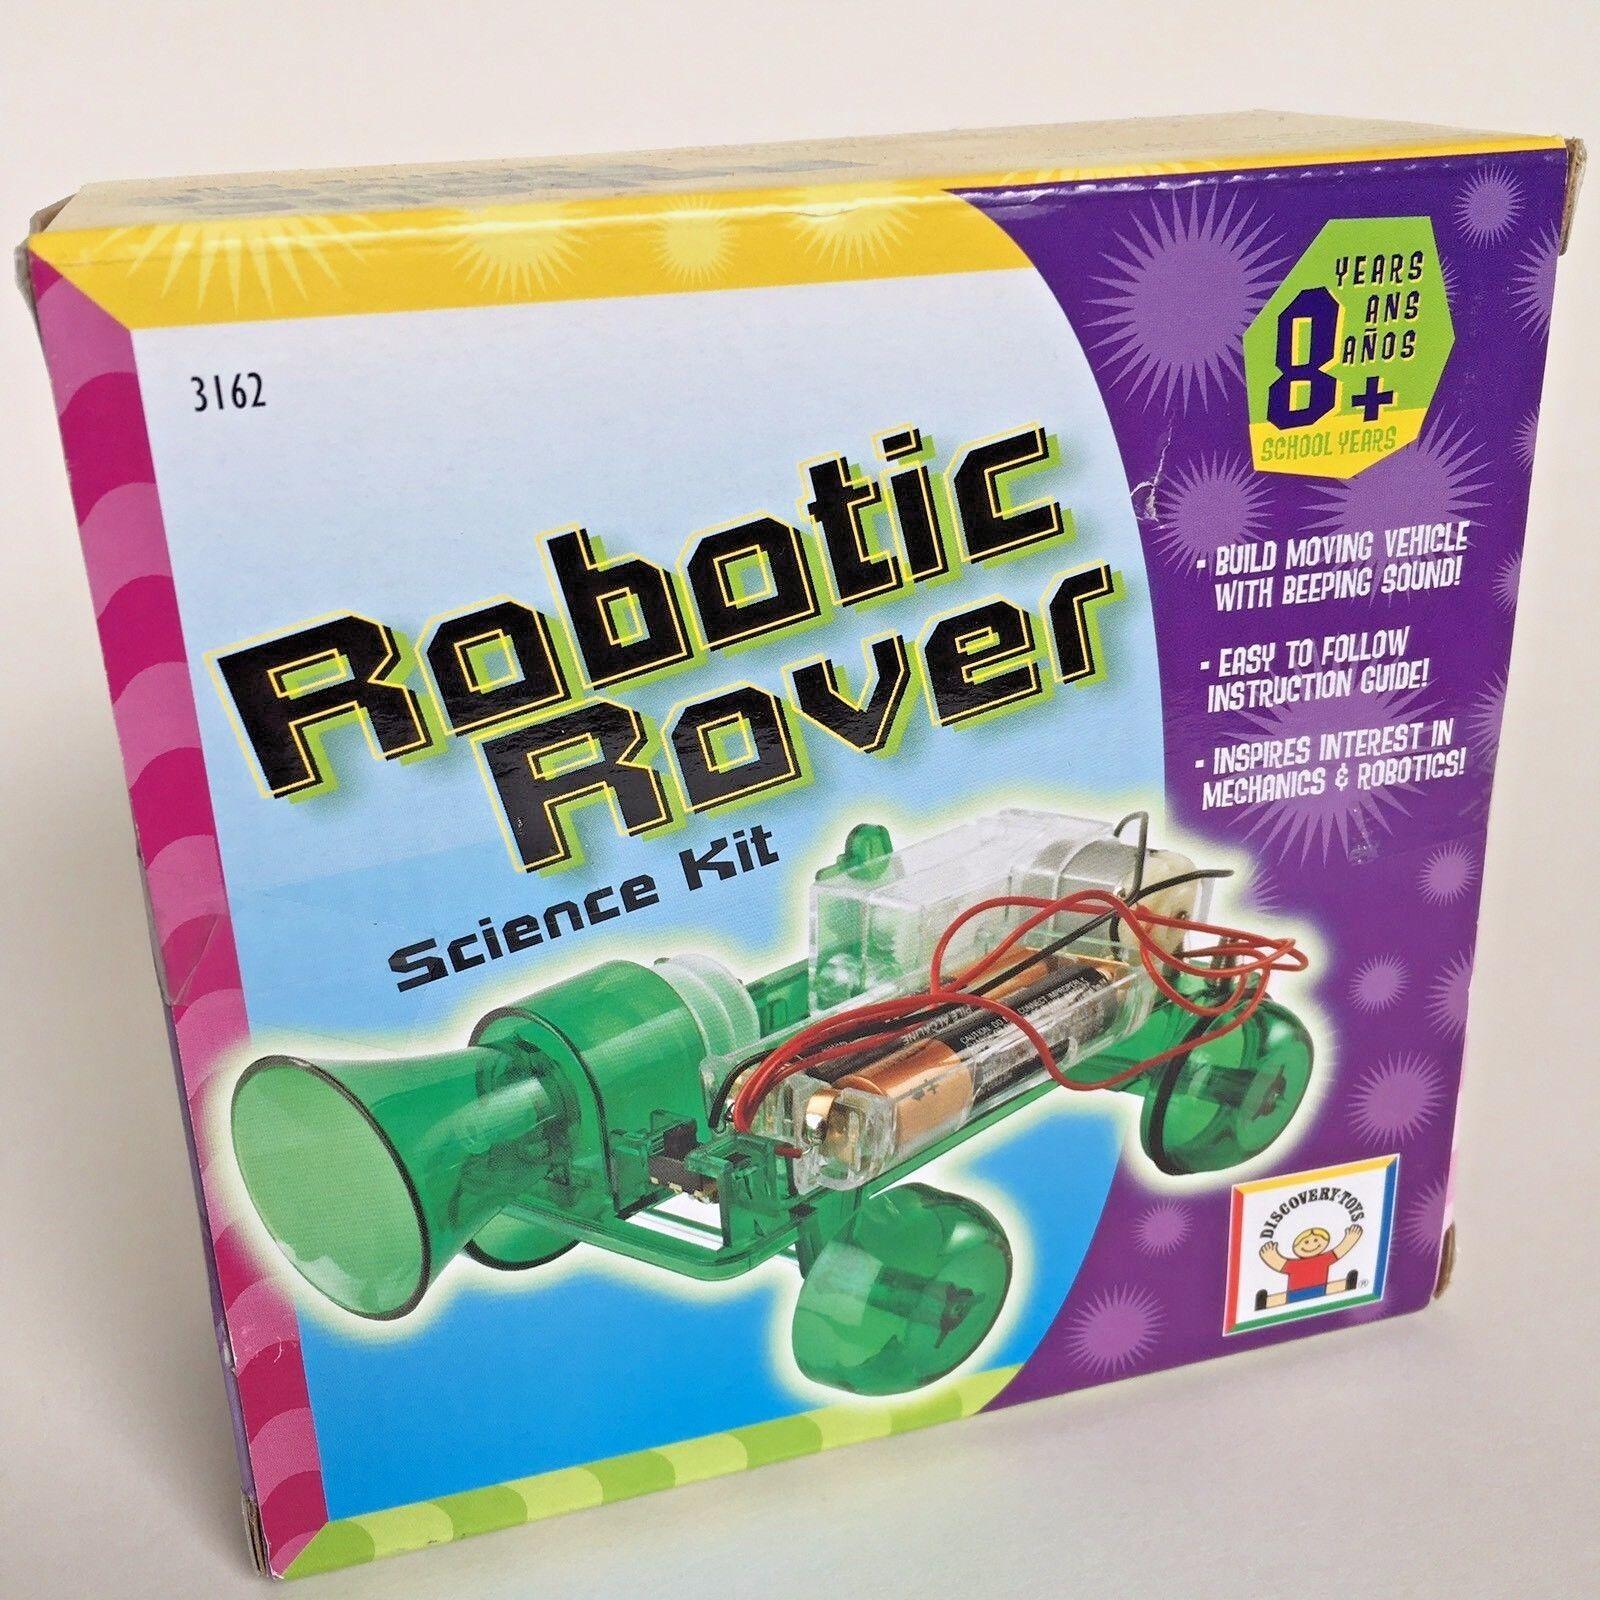 Raro Kit Ciencia Rover Discovery Juguetes robótica, Aprendizaje Juguete Educativo